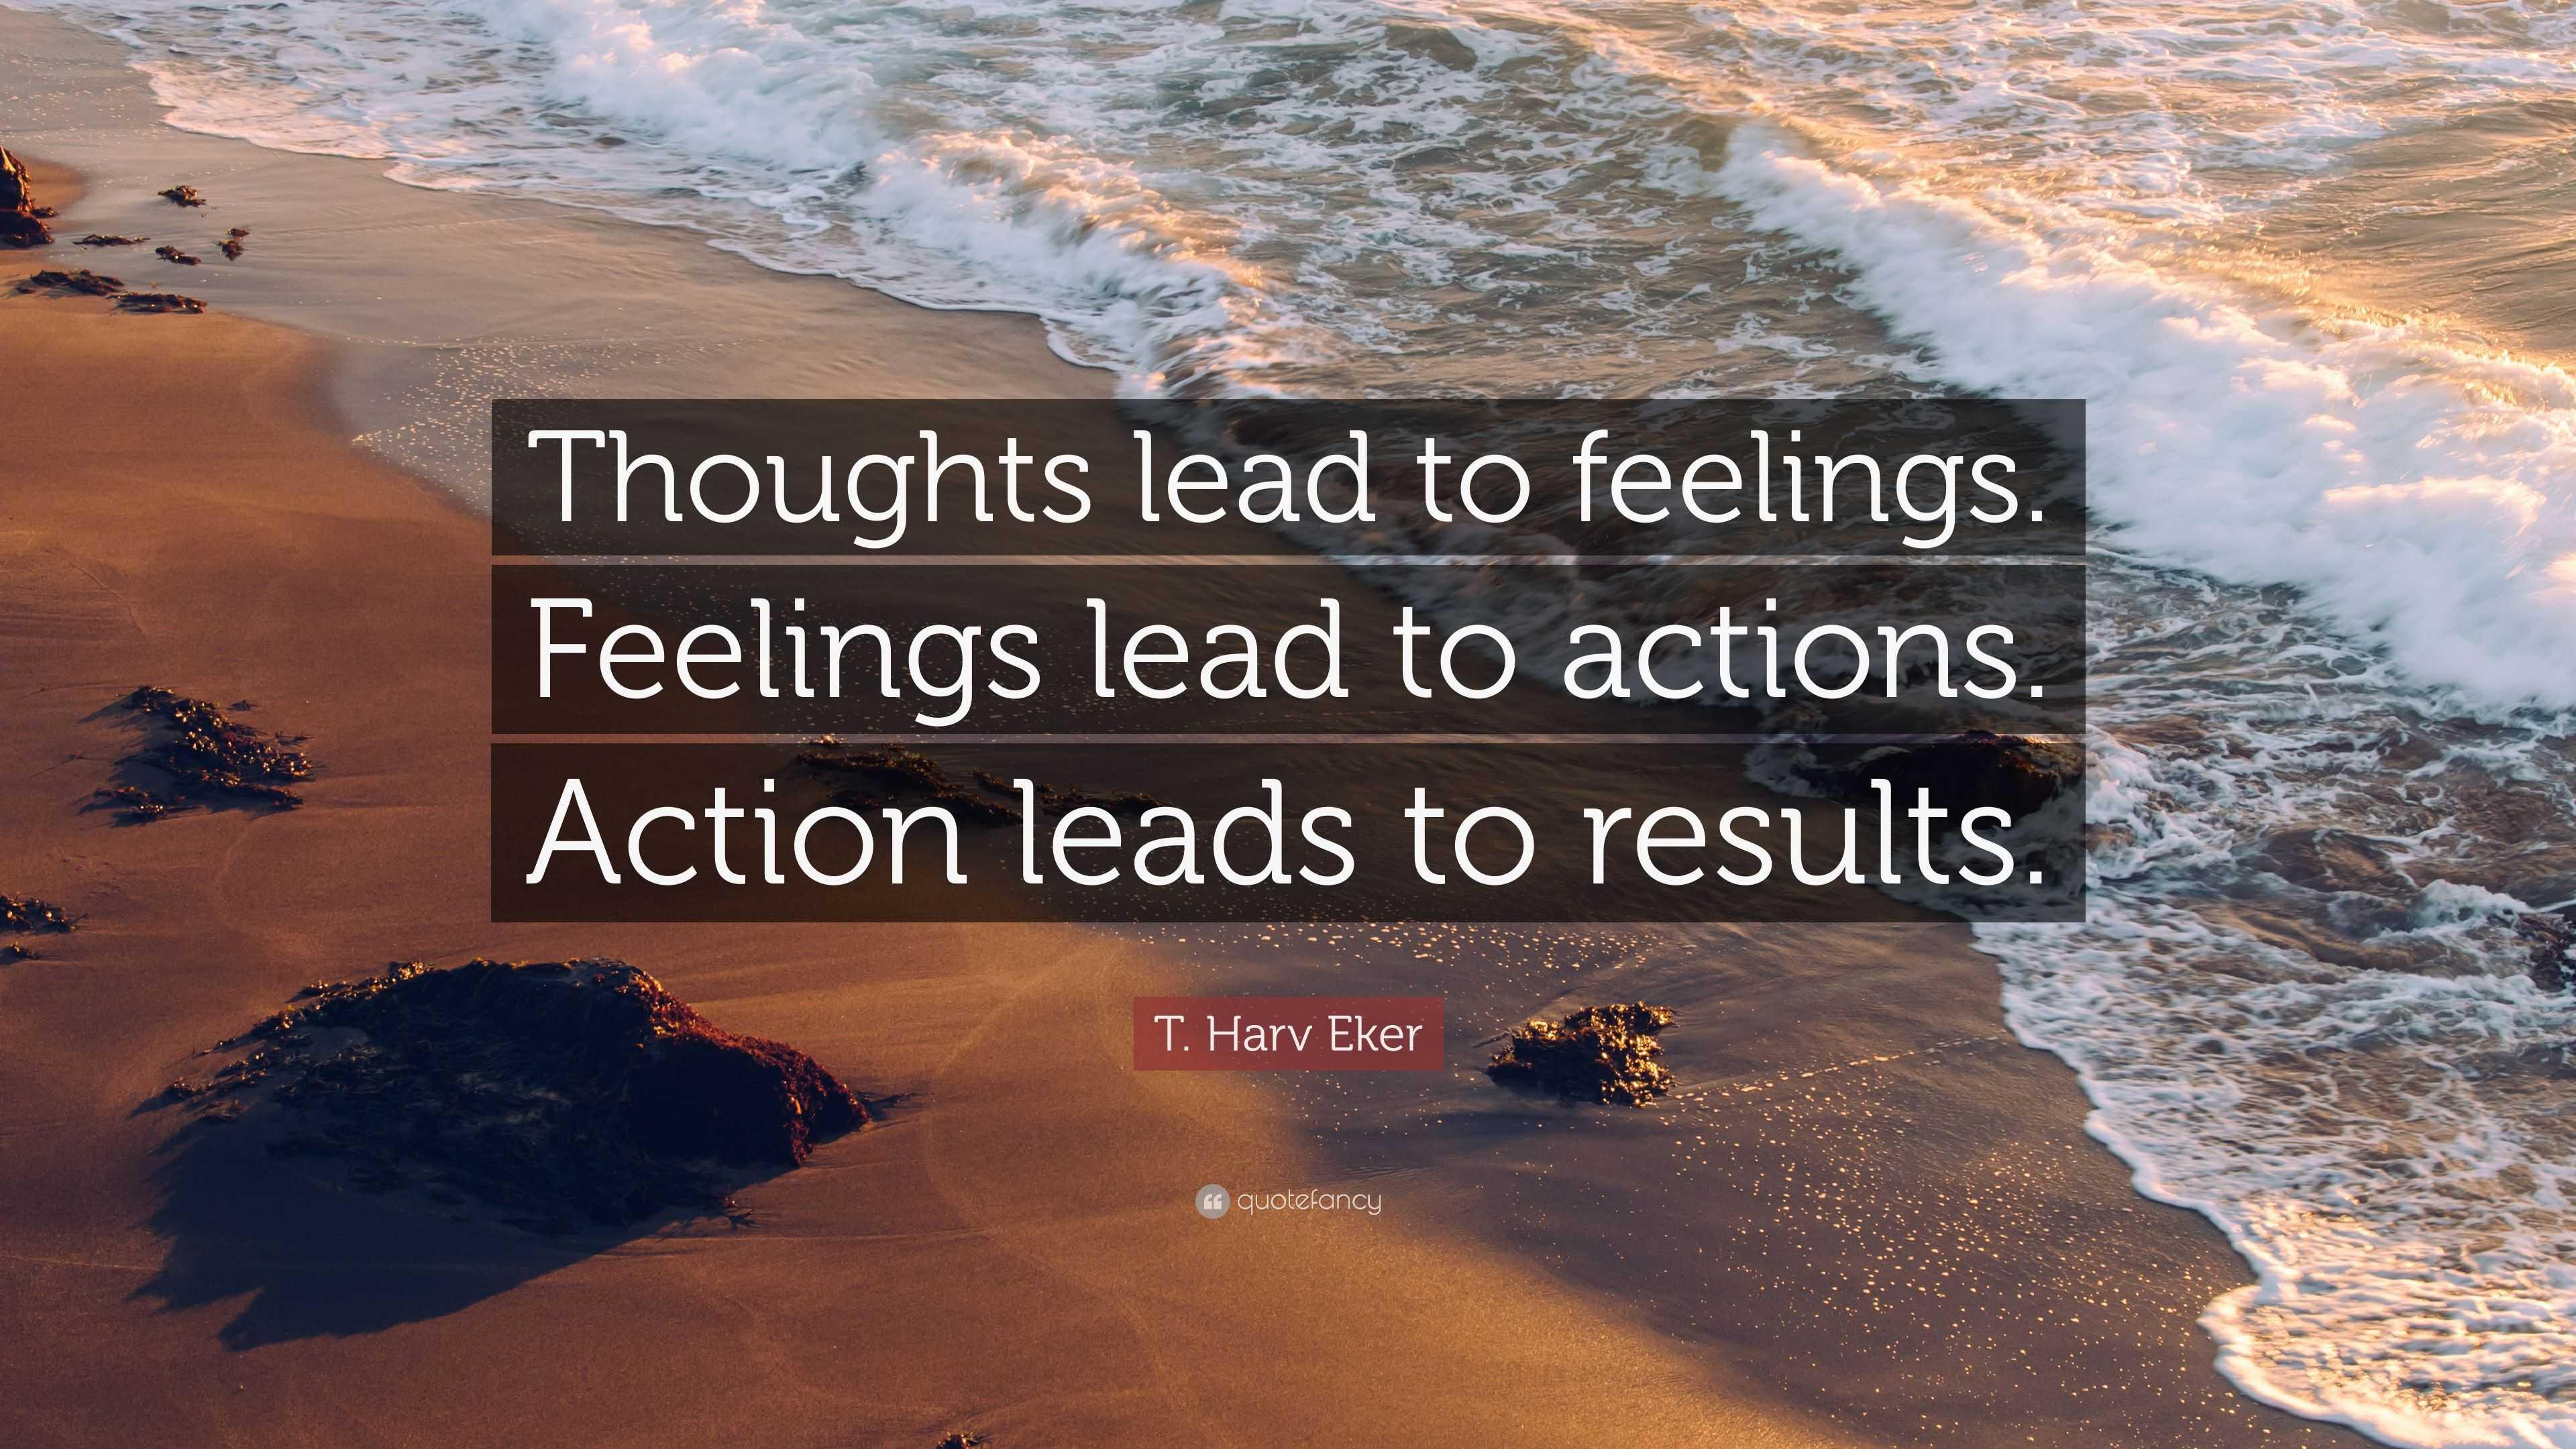 T Harv Eker Quote Thoughts Lead To Feelings Feelings